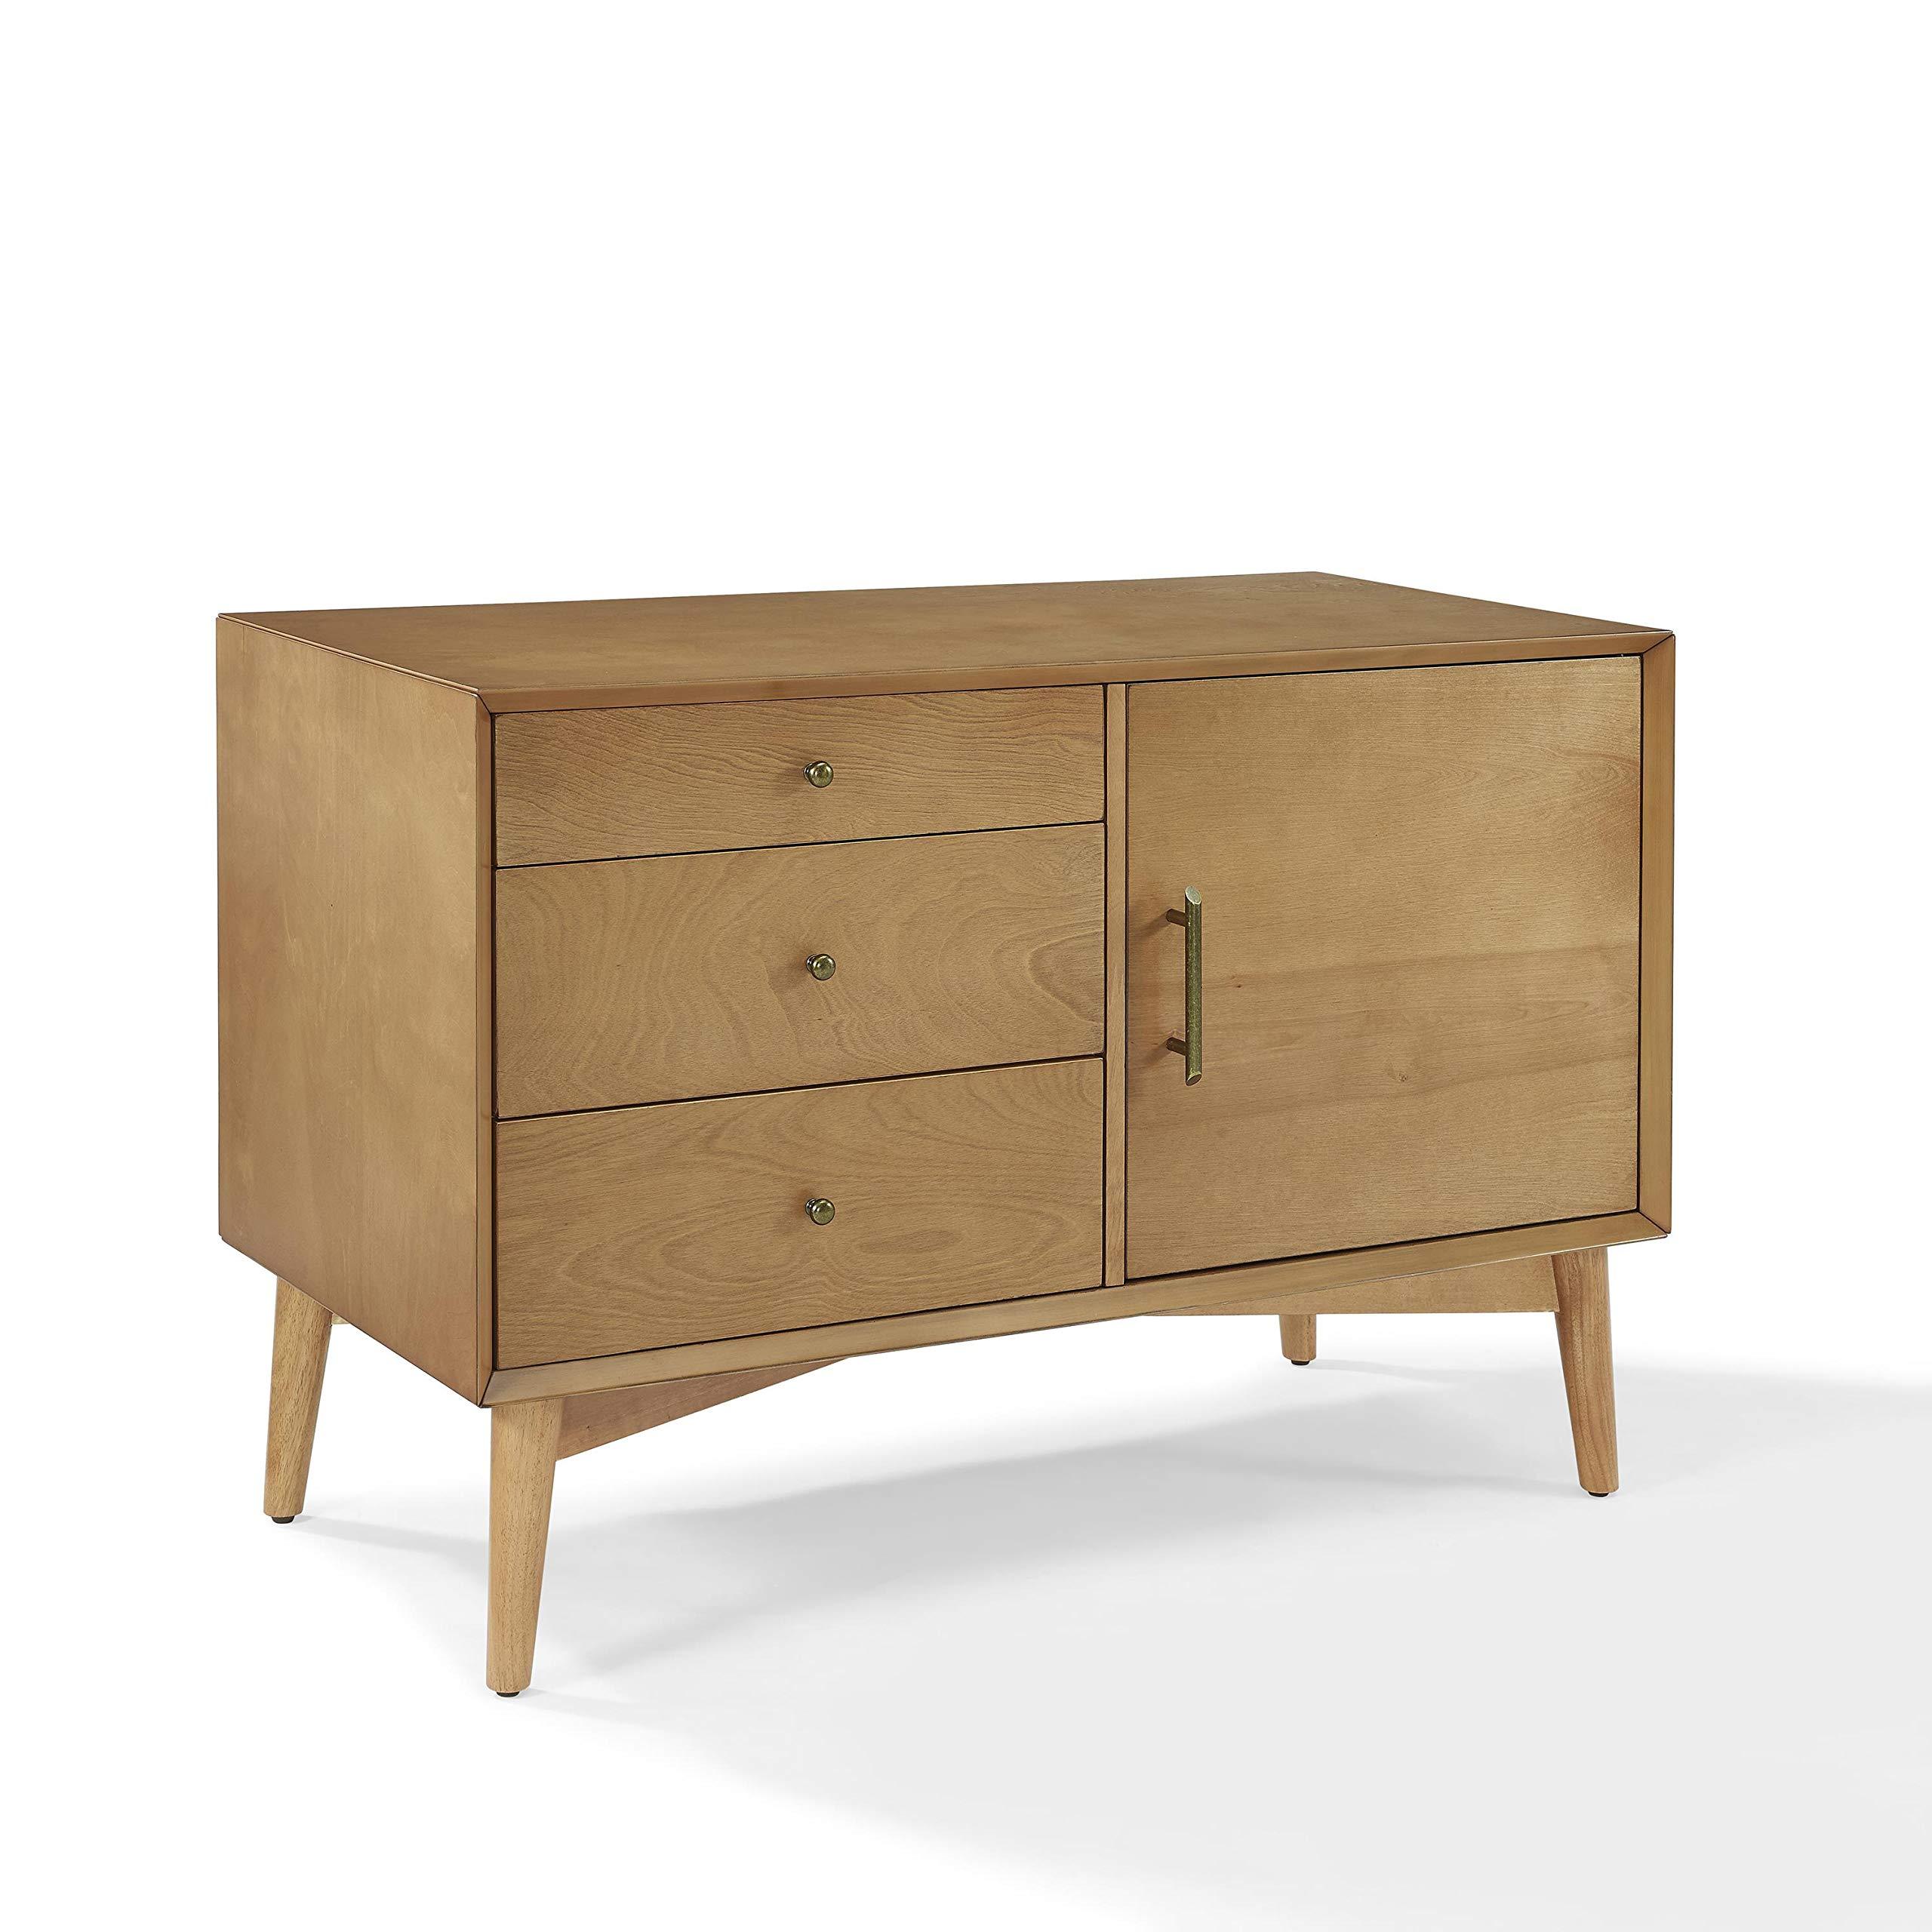 Crosley Furniture Landon Mid-Century Media Console - Acorn by Crosley Furniture